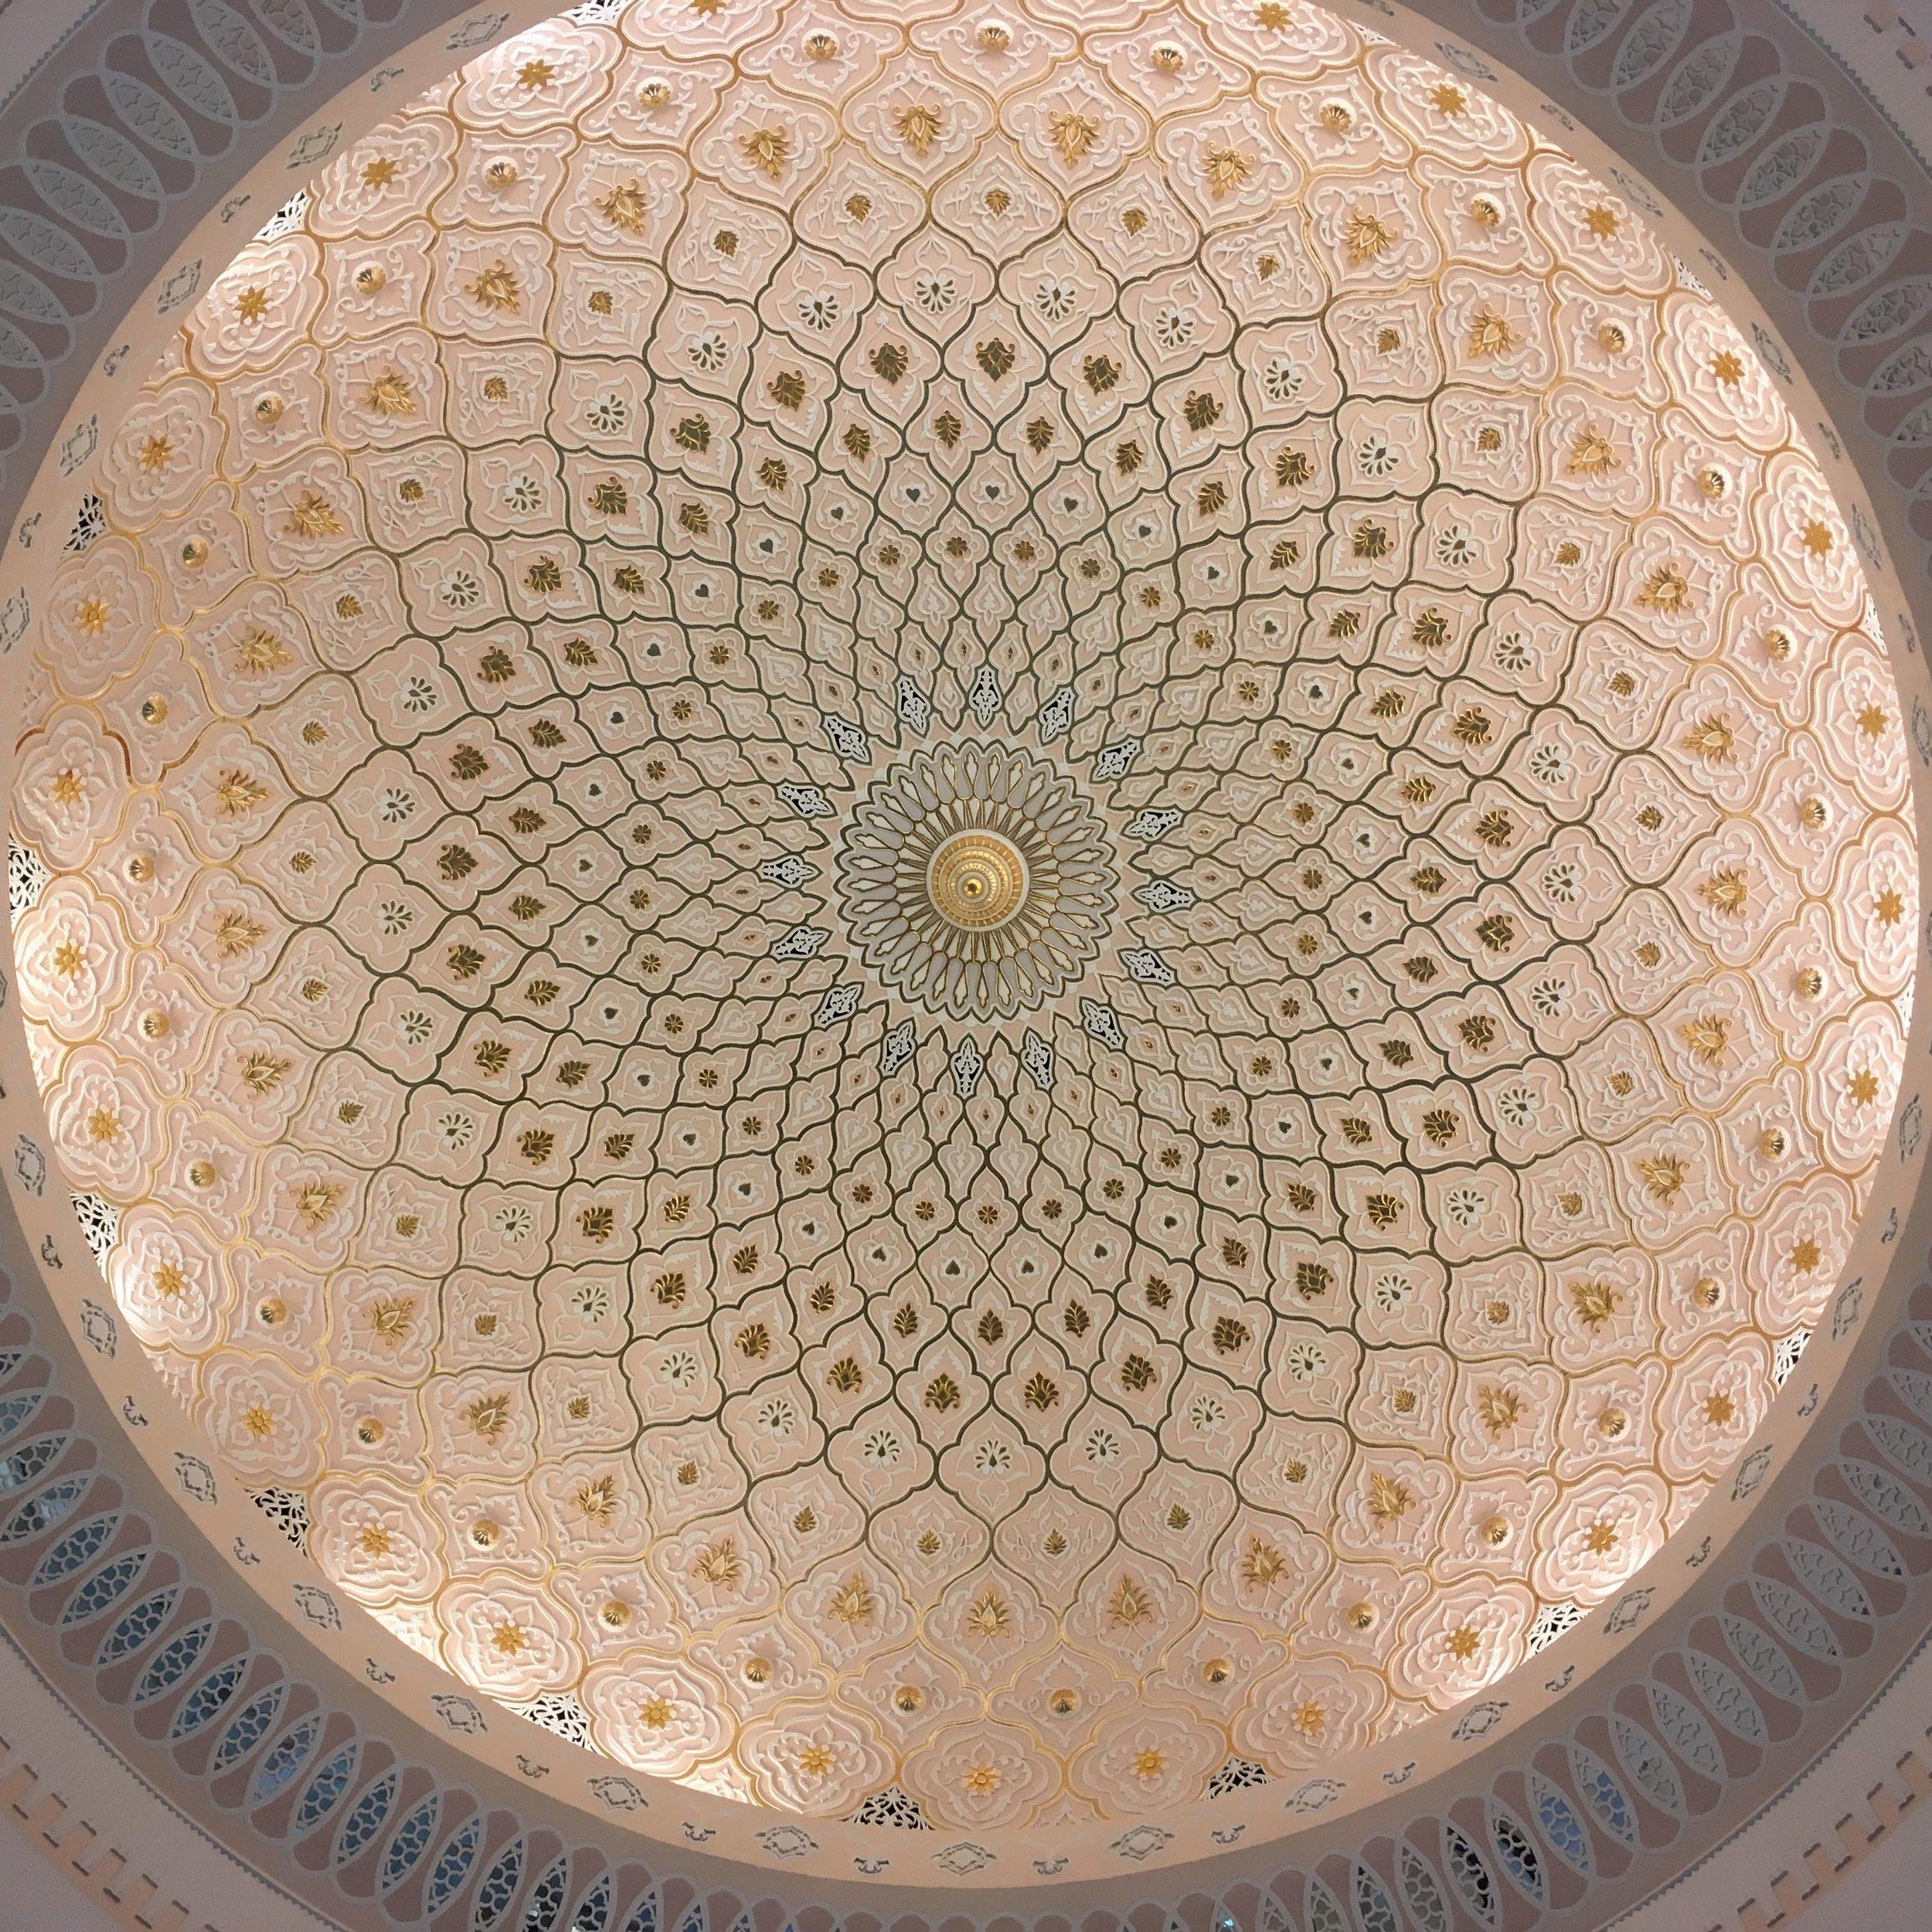 ceiling dome at the Islamic Arts Museum in Kuala Lumpur, Malaysia